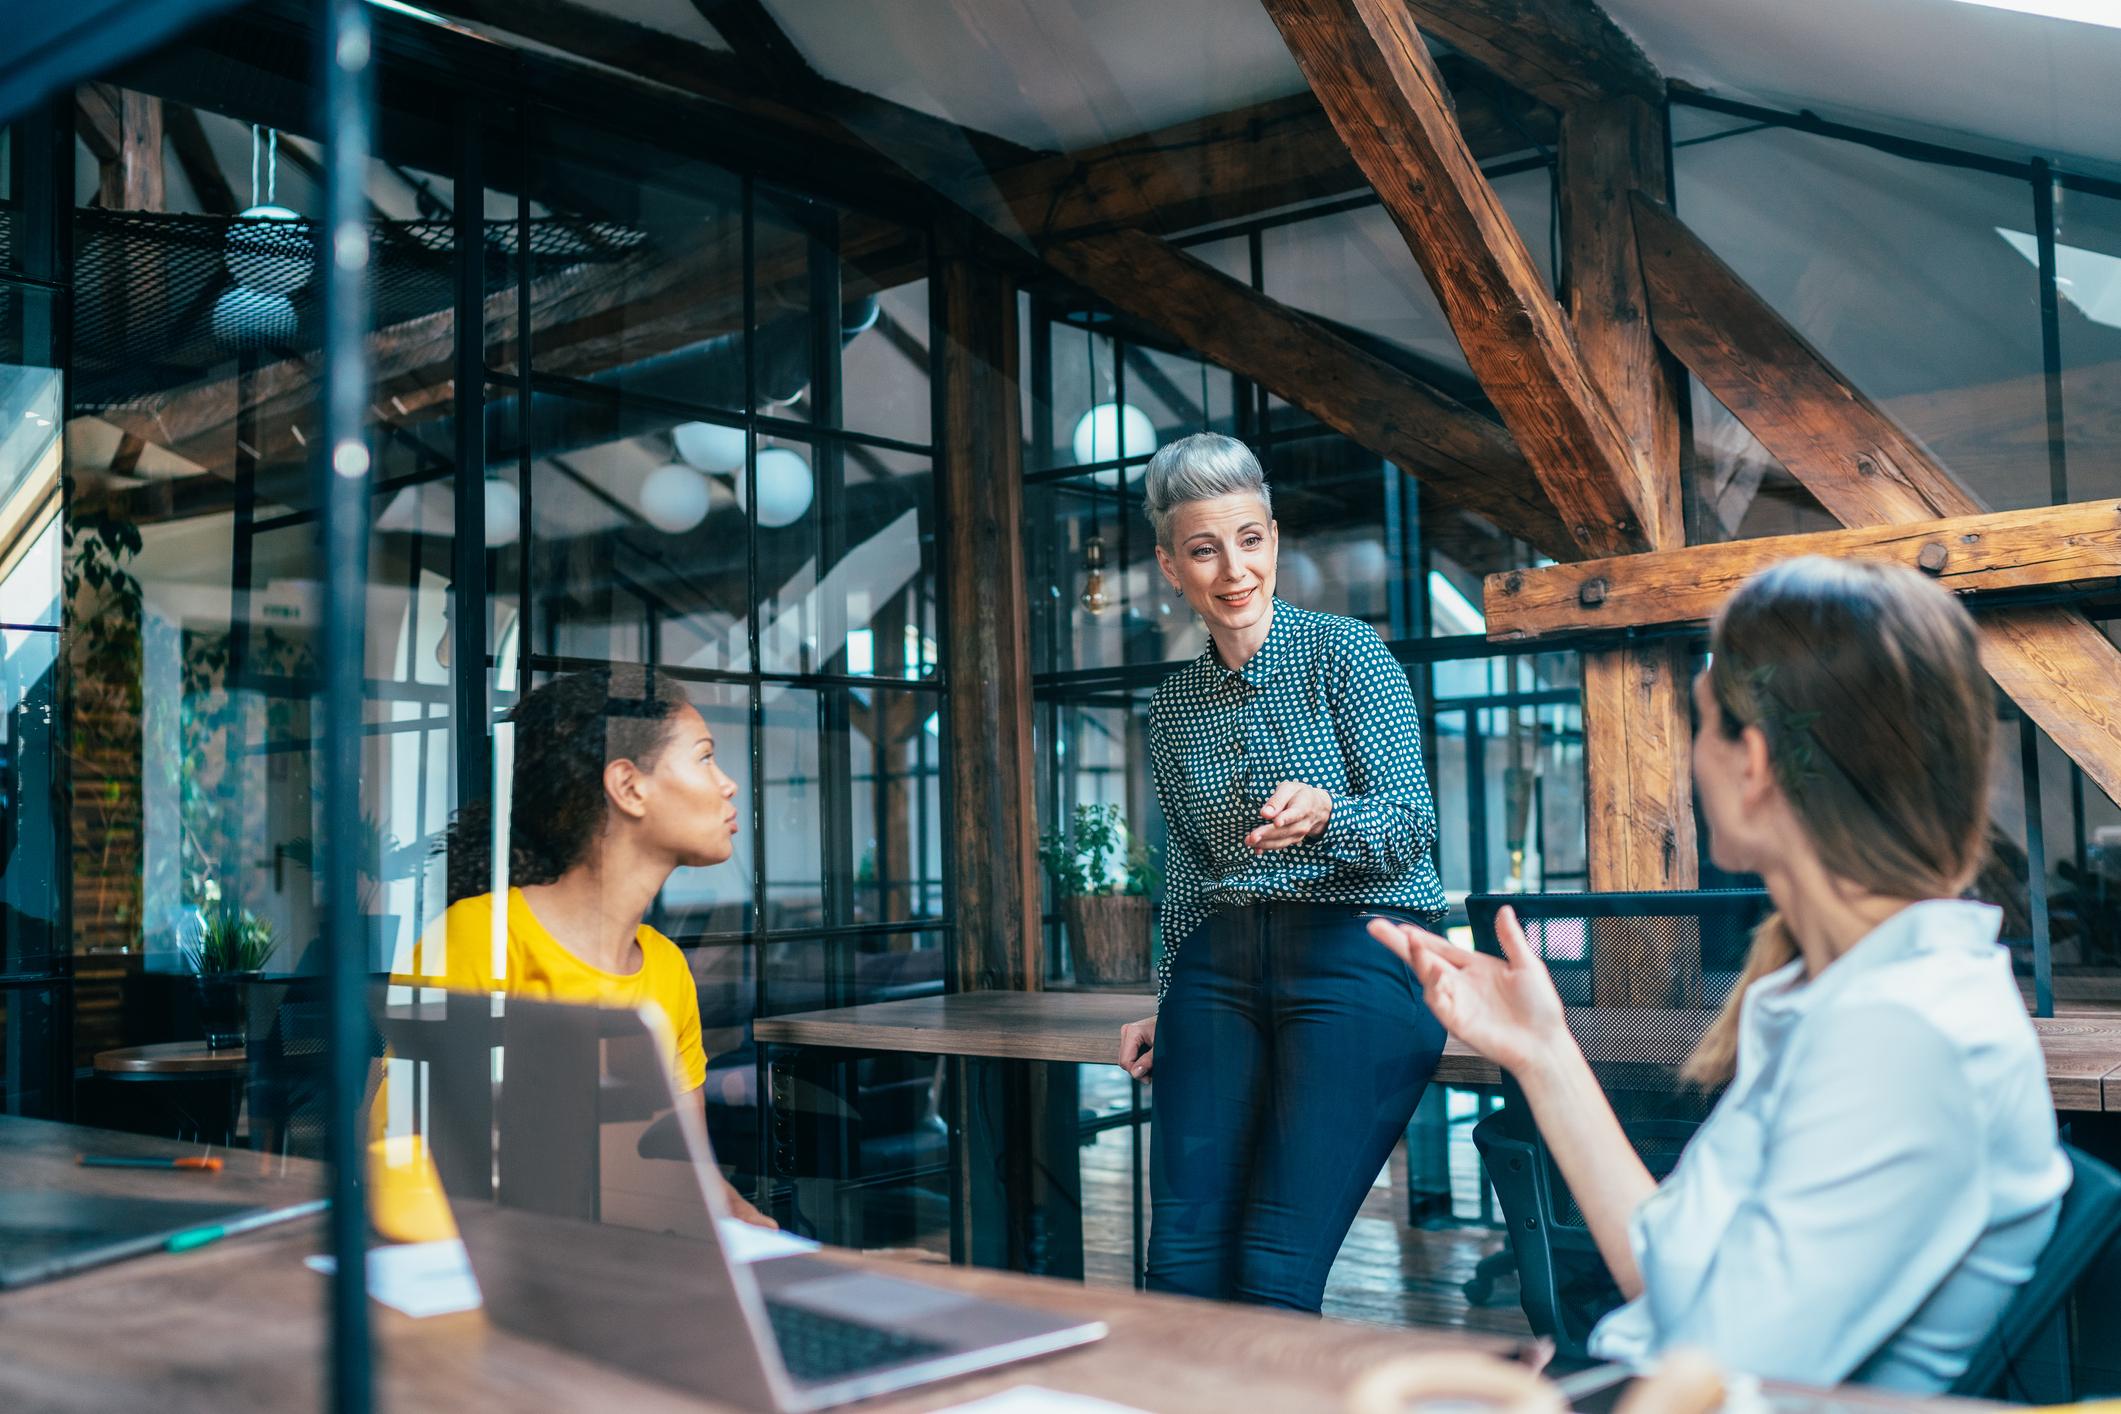 Coach de Realidad Virtual para fomentar habilidades de liderazgo